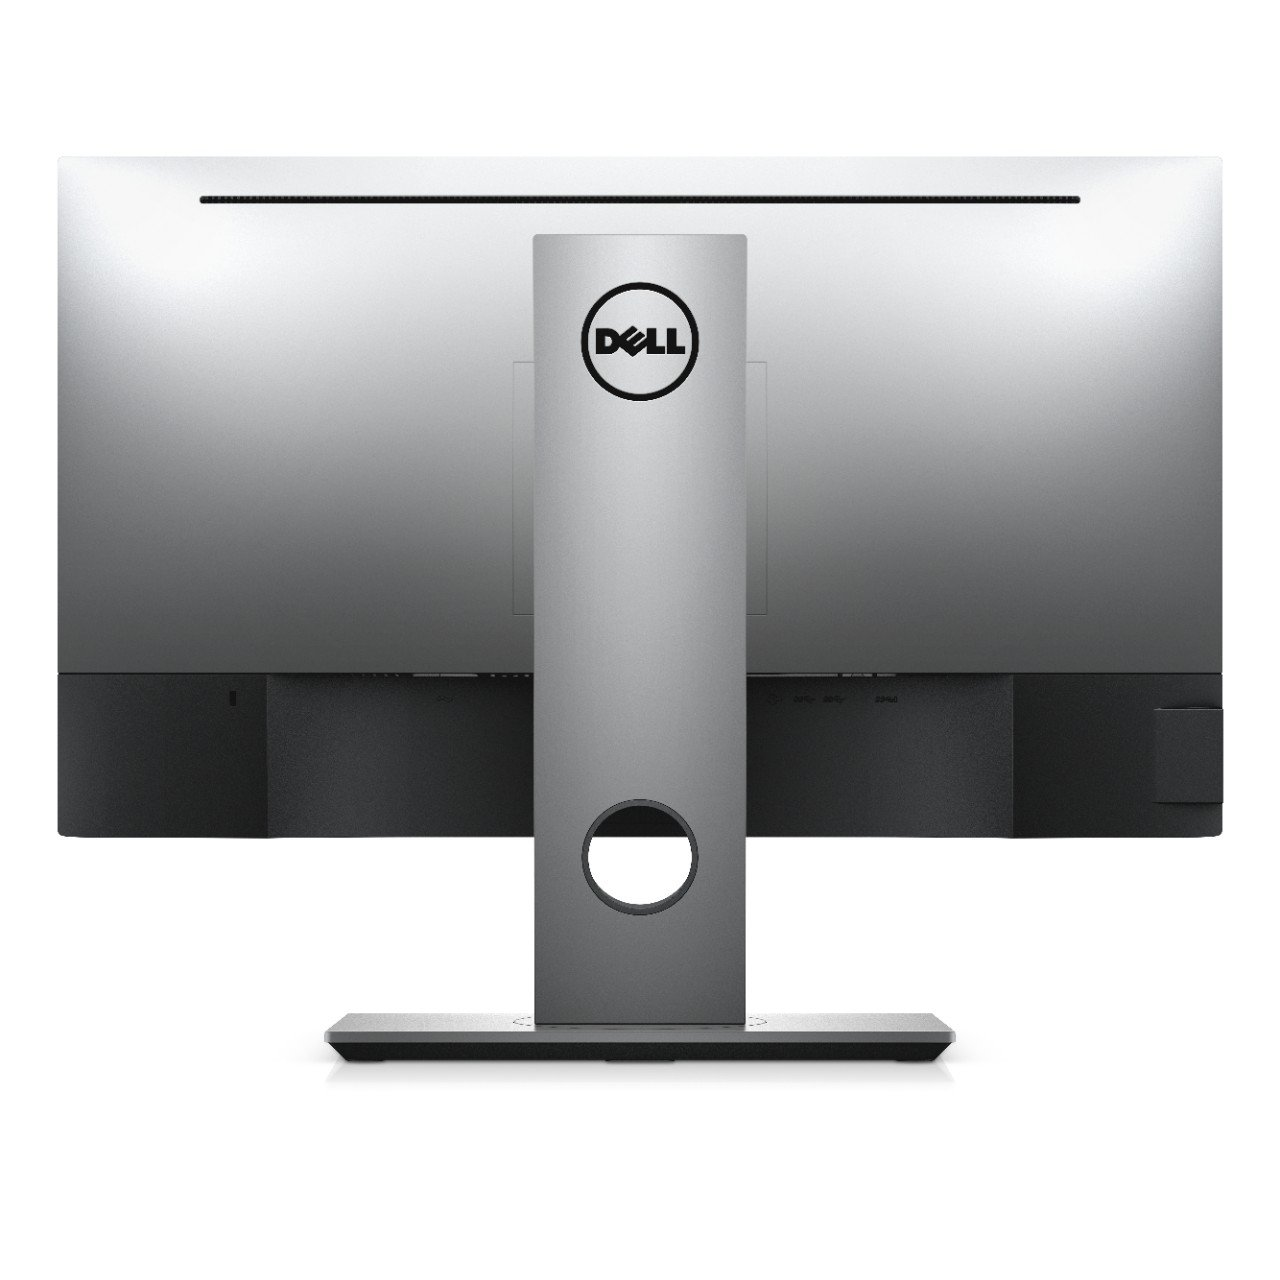 Dell Ultra Sharp LED-Lit Monitor 25'' Black (U2518D)  2560 X 1440 at 60 Hz  IPS  Vesa Mount Compatibility by Dell (Image #6)